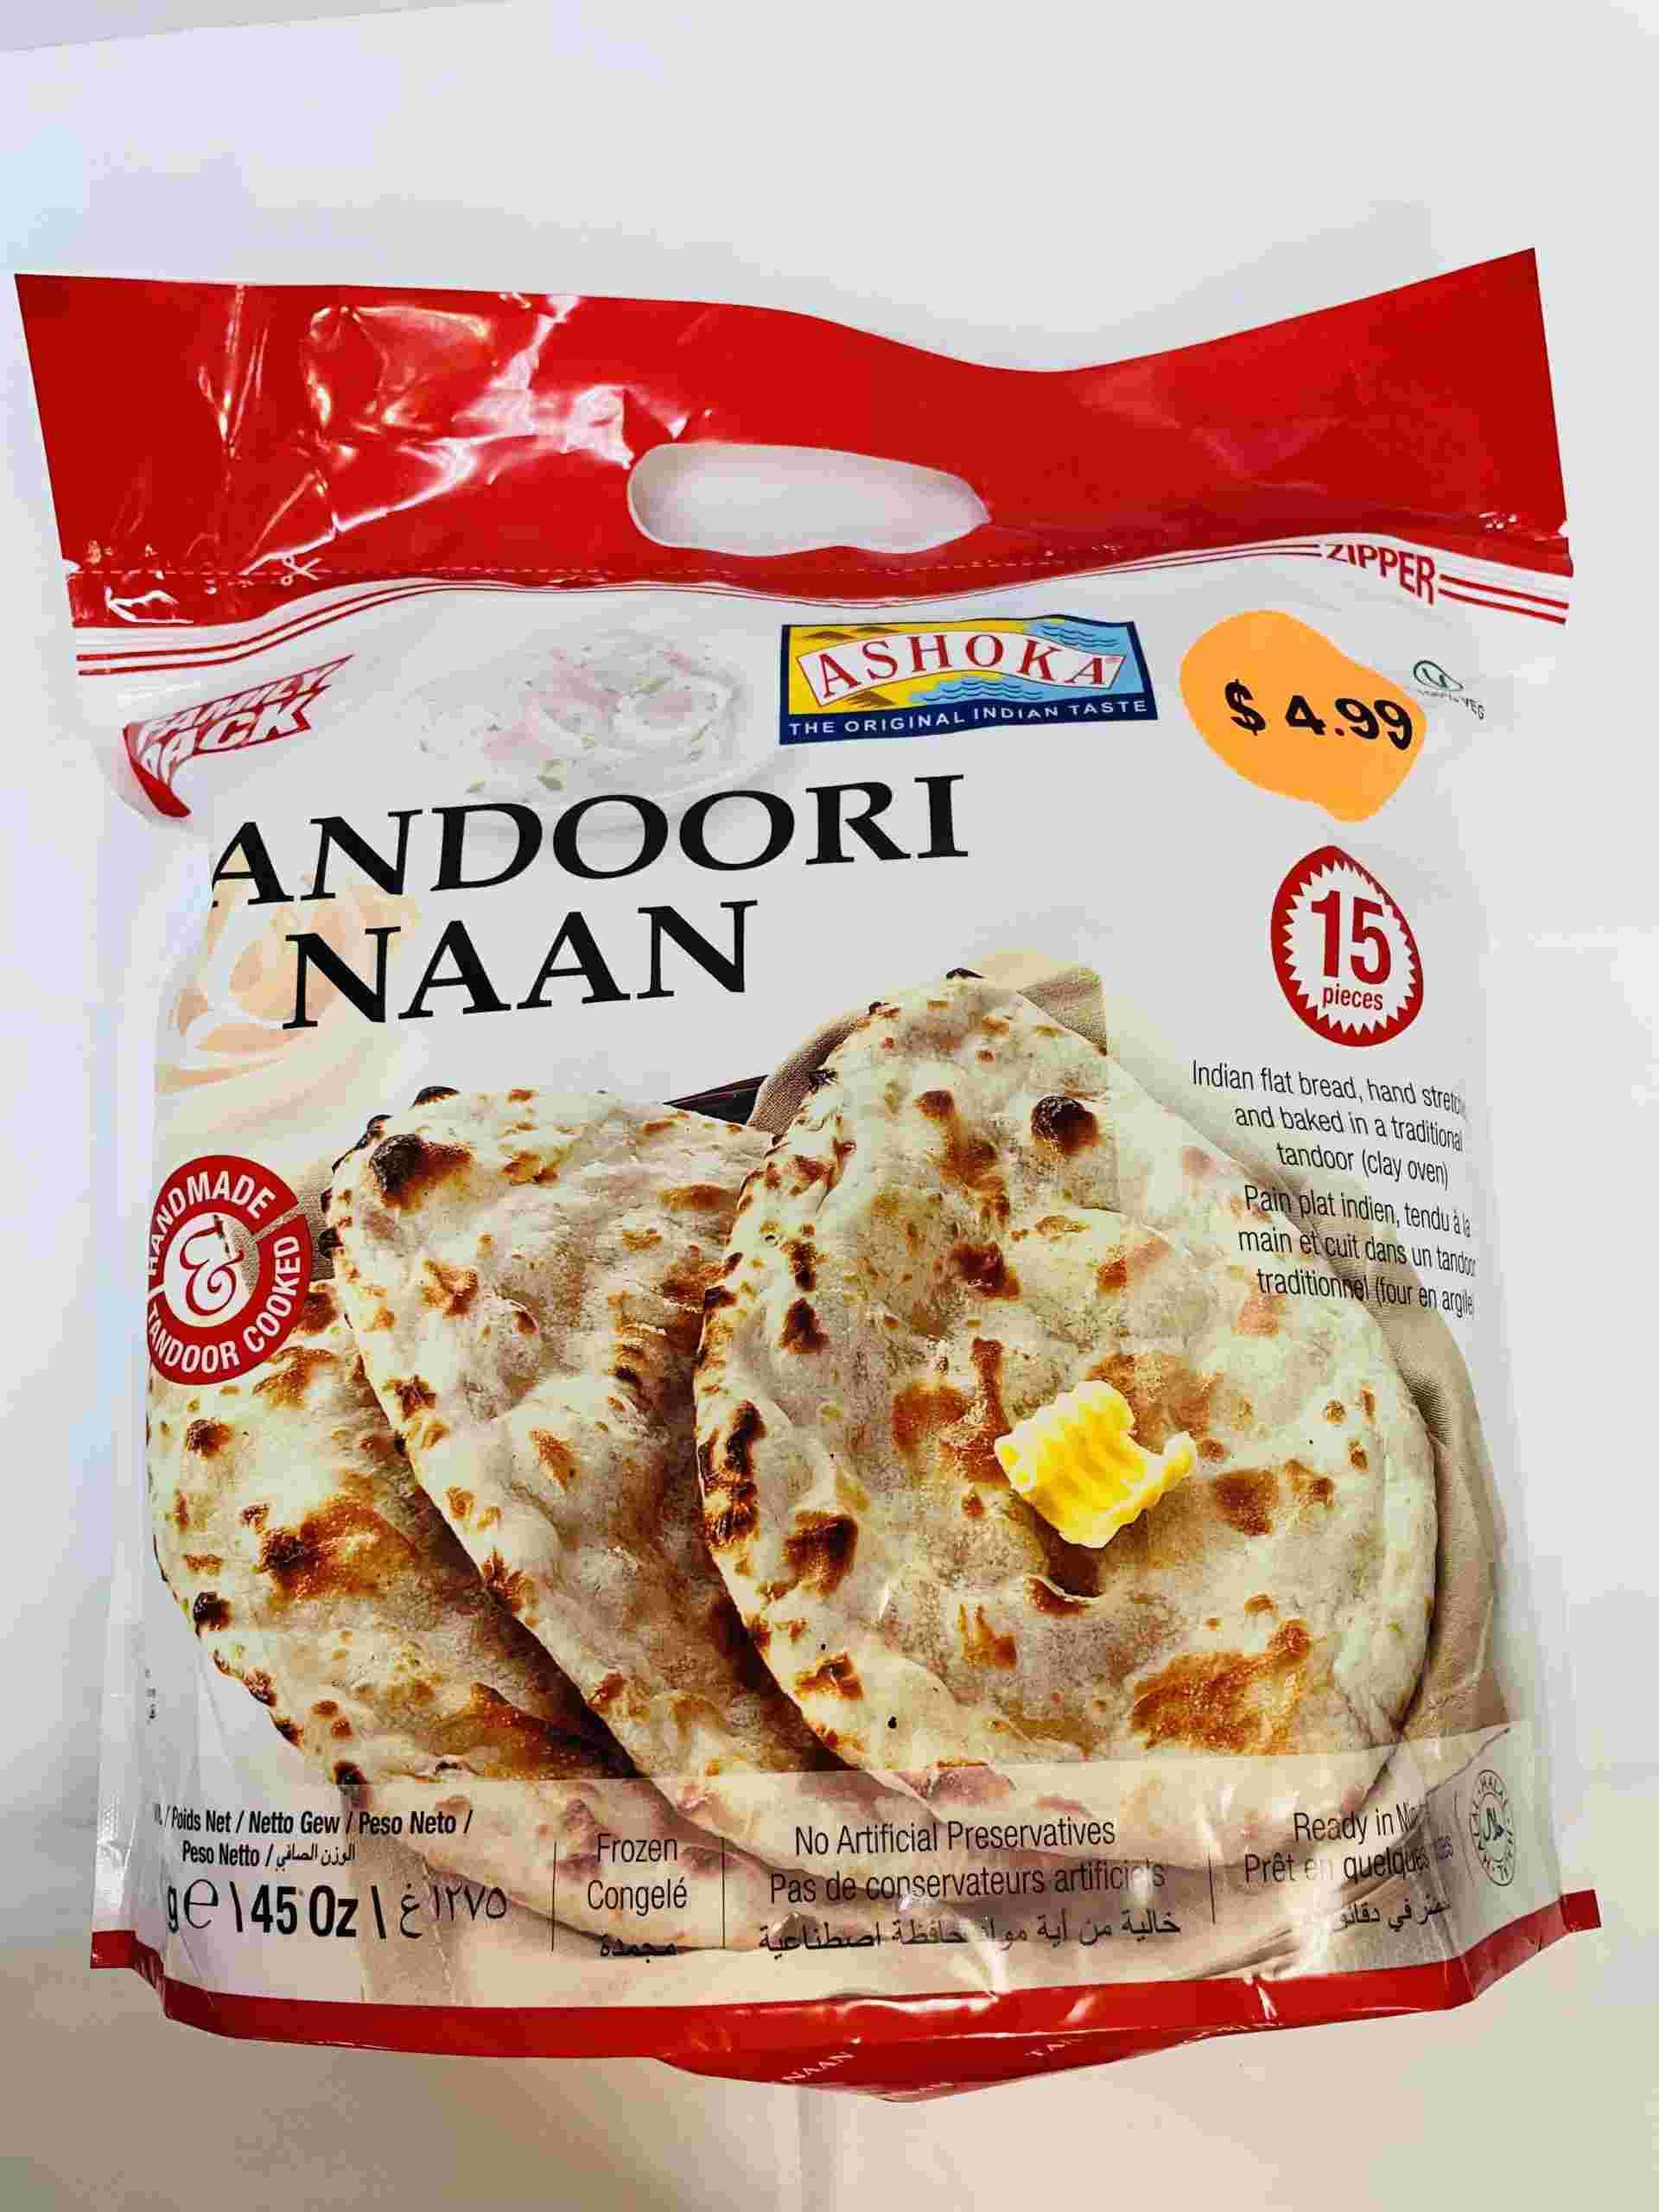 Ashoka Tandoori Naan 15 Pieces